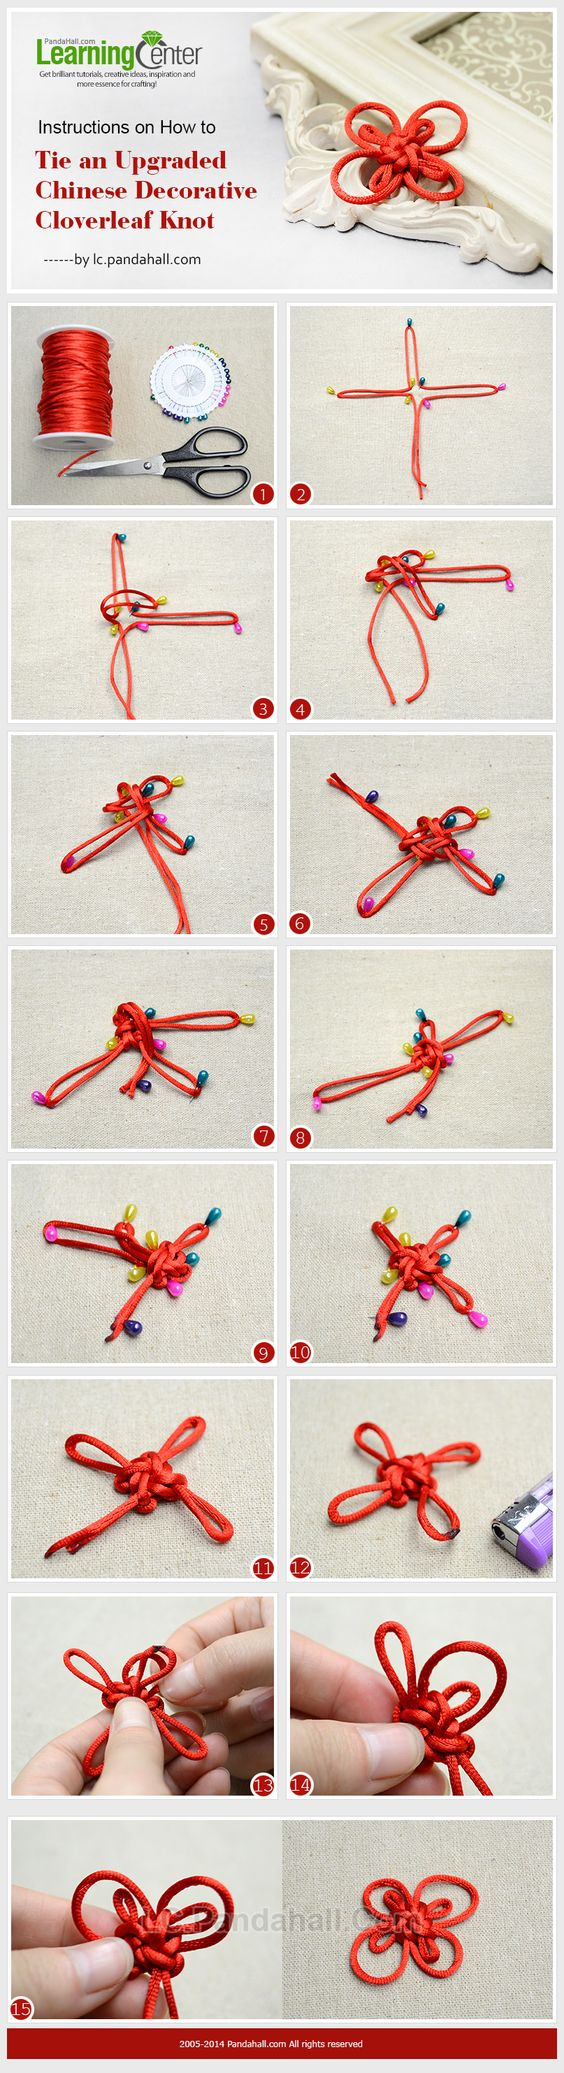 Asian knot tying kit